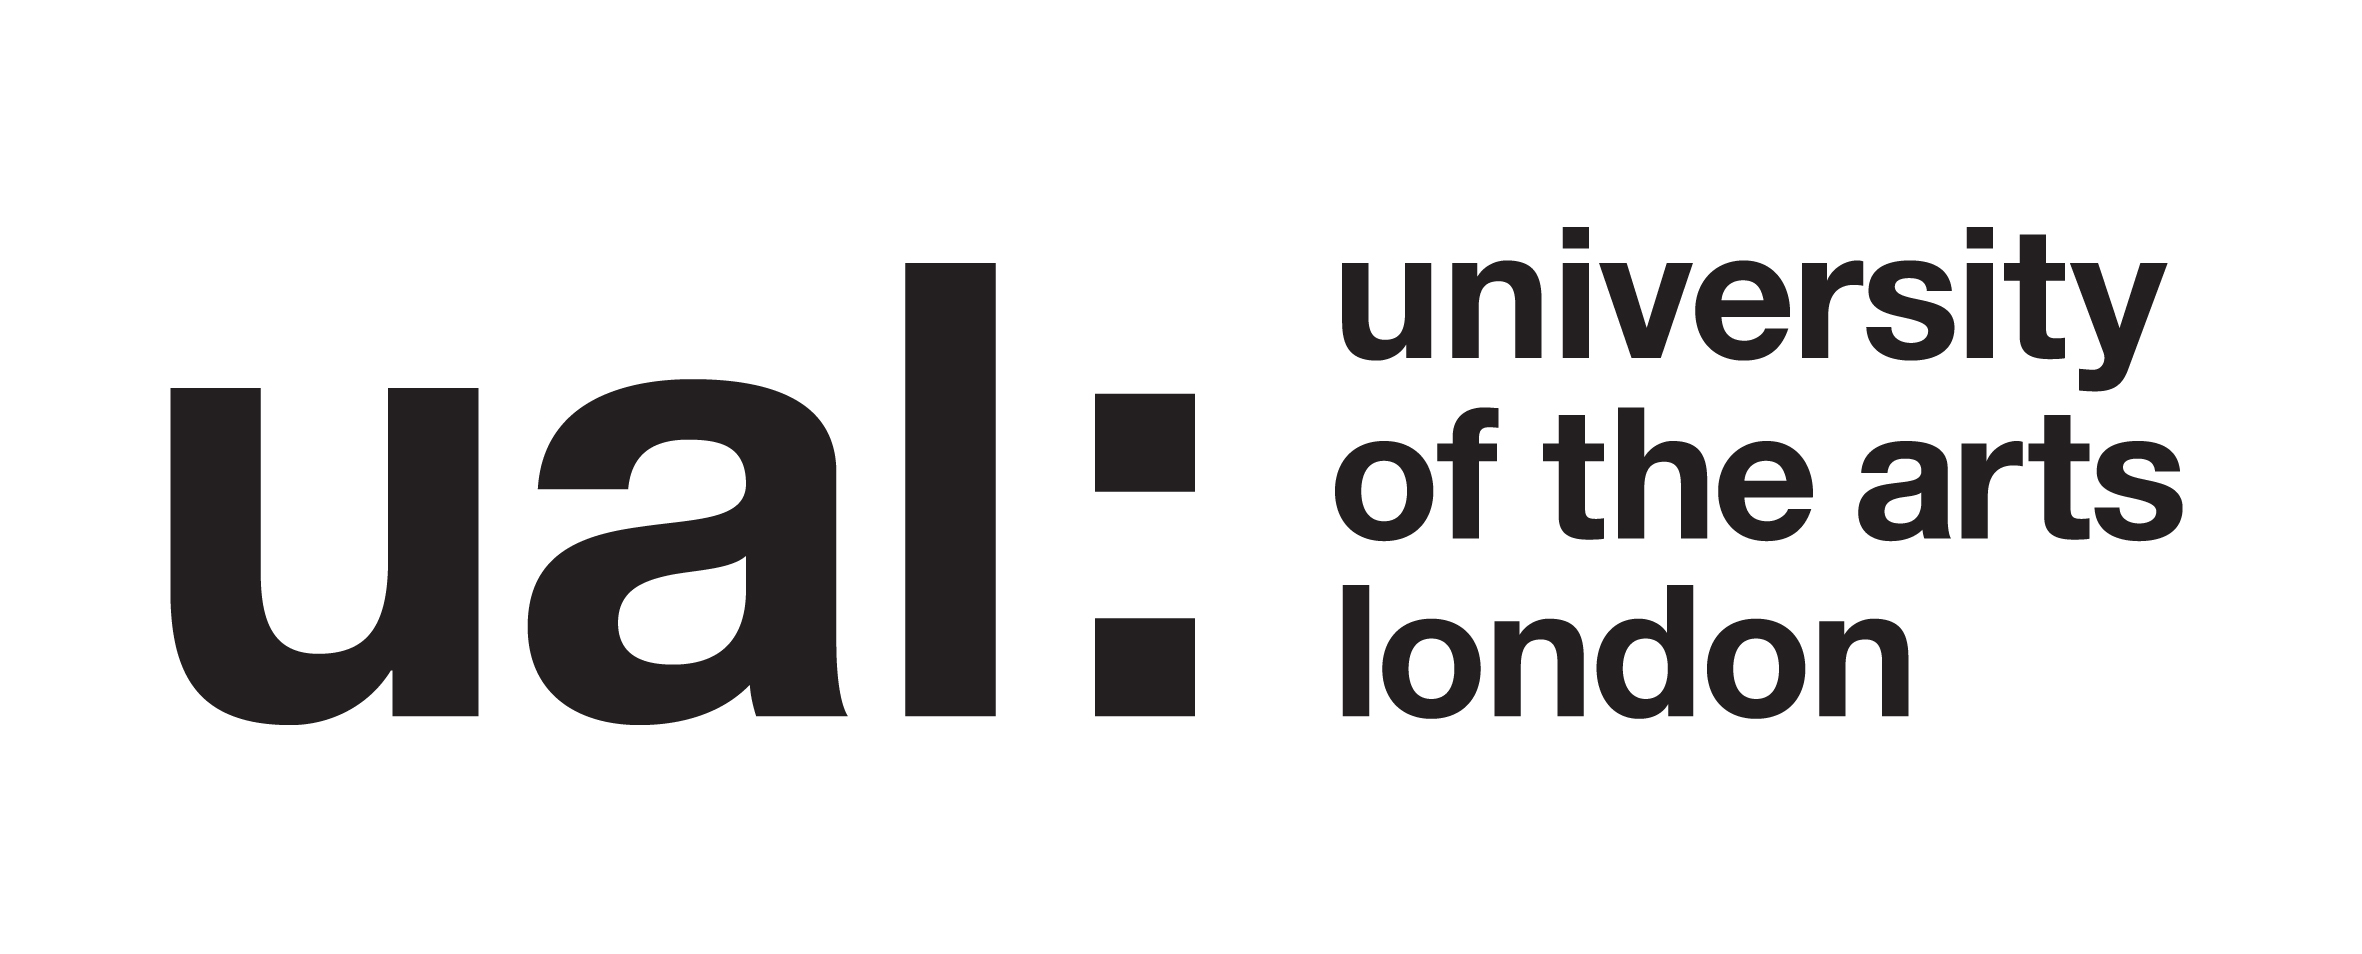 「University of the Arts London」的圖片搜尋結果